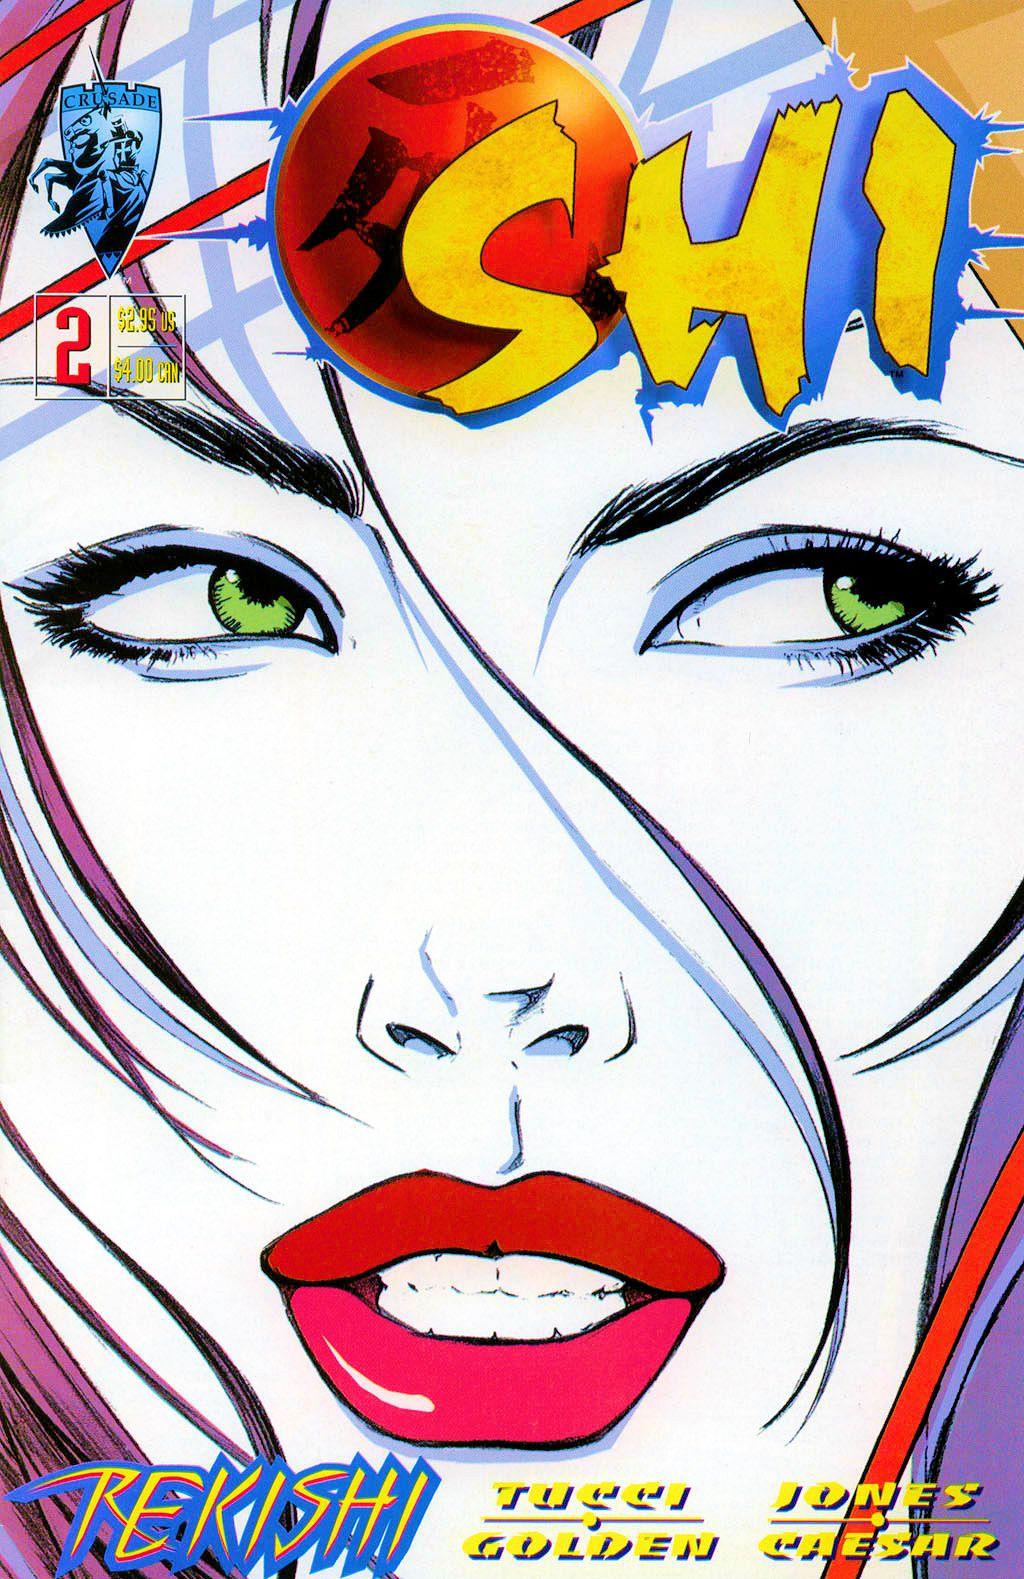 Read online Shi: Rekishi comic -  Issue #2 - 1